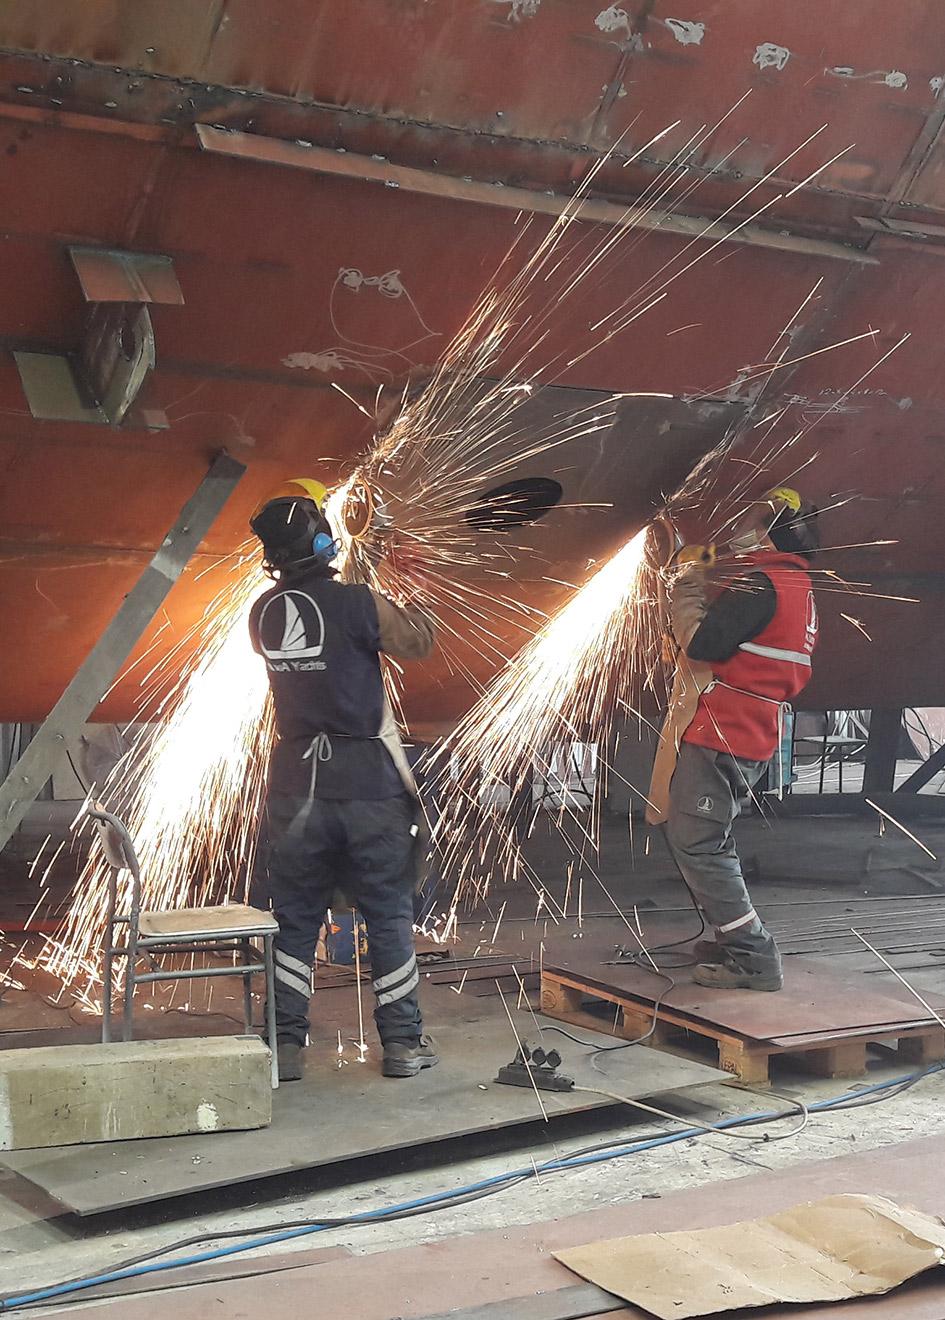 workmen-cut-into-the-hull-of-kando-at-ava-yachts